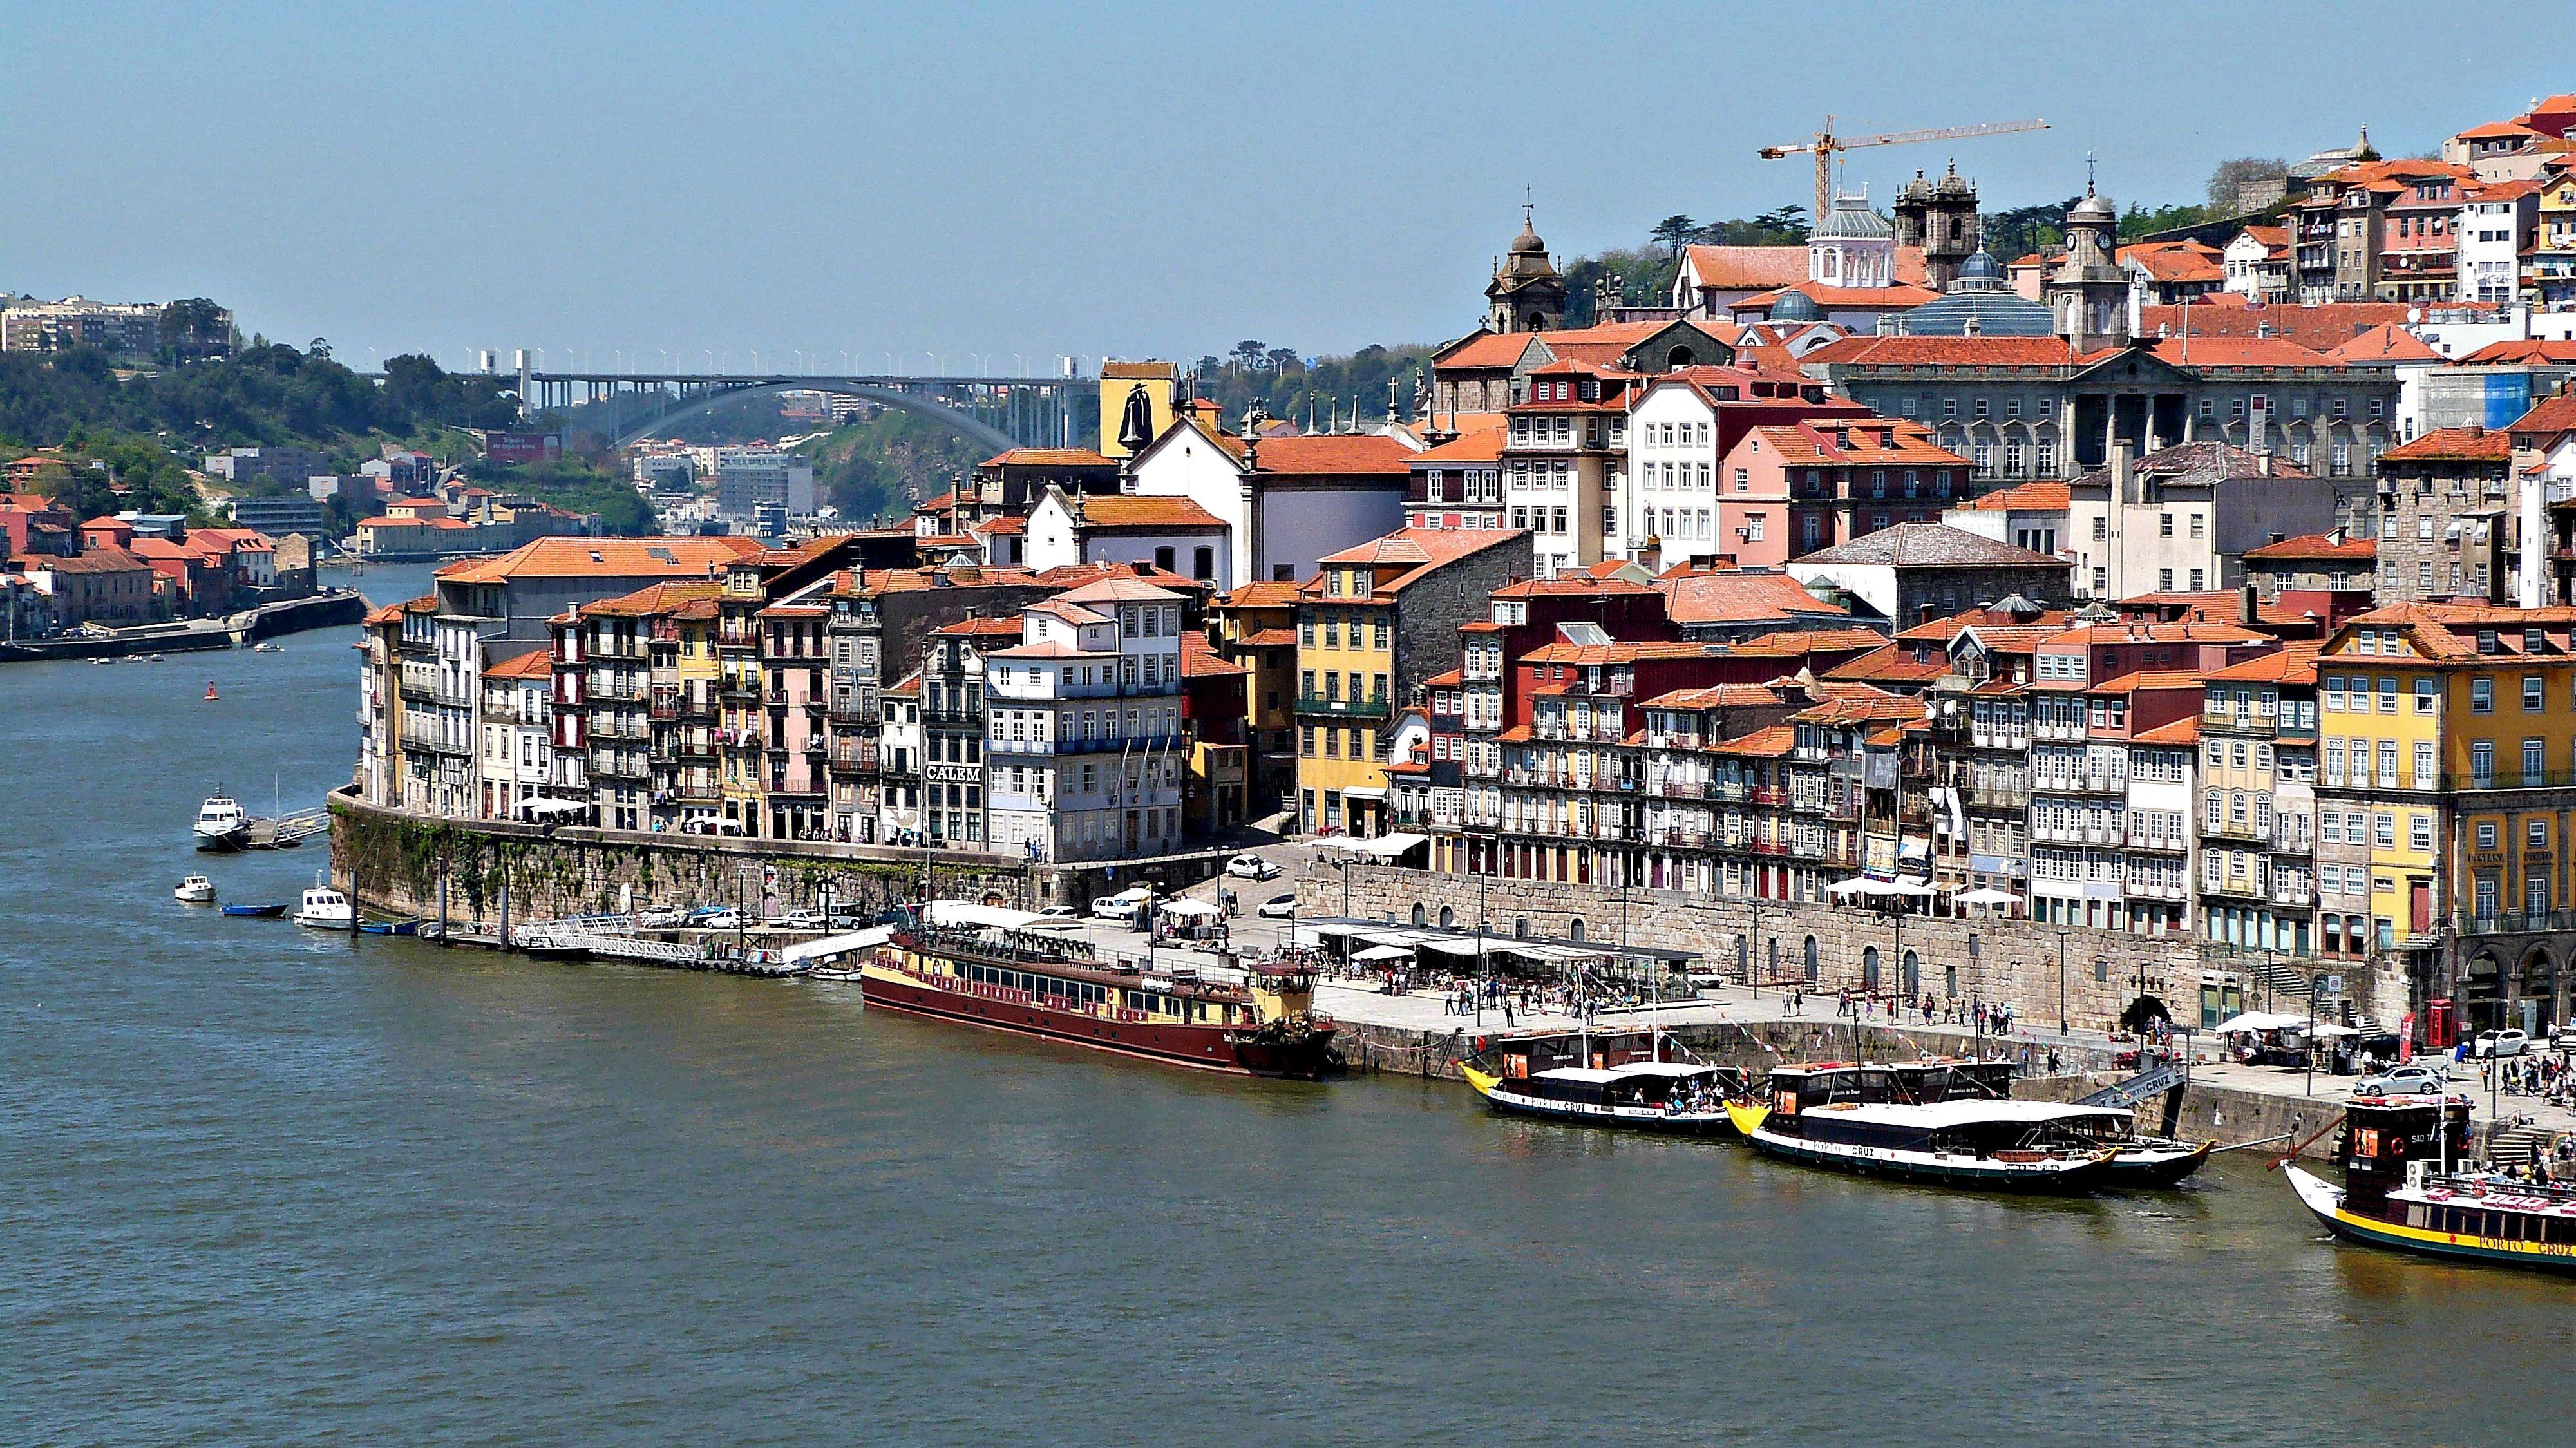 Hintergrundbilder : Menschen, Schiff, Boot, alt, Meer, Stadt ...